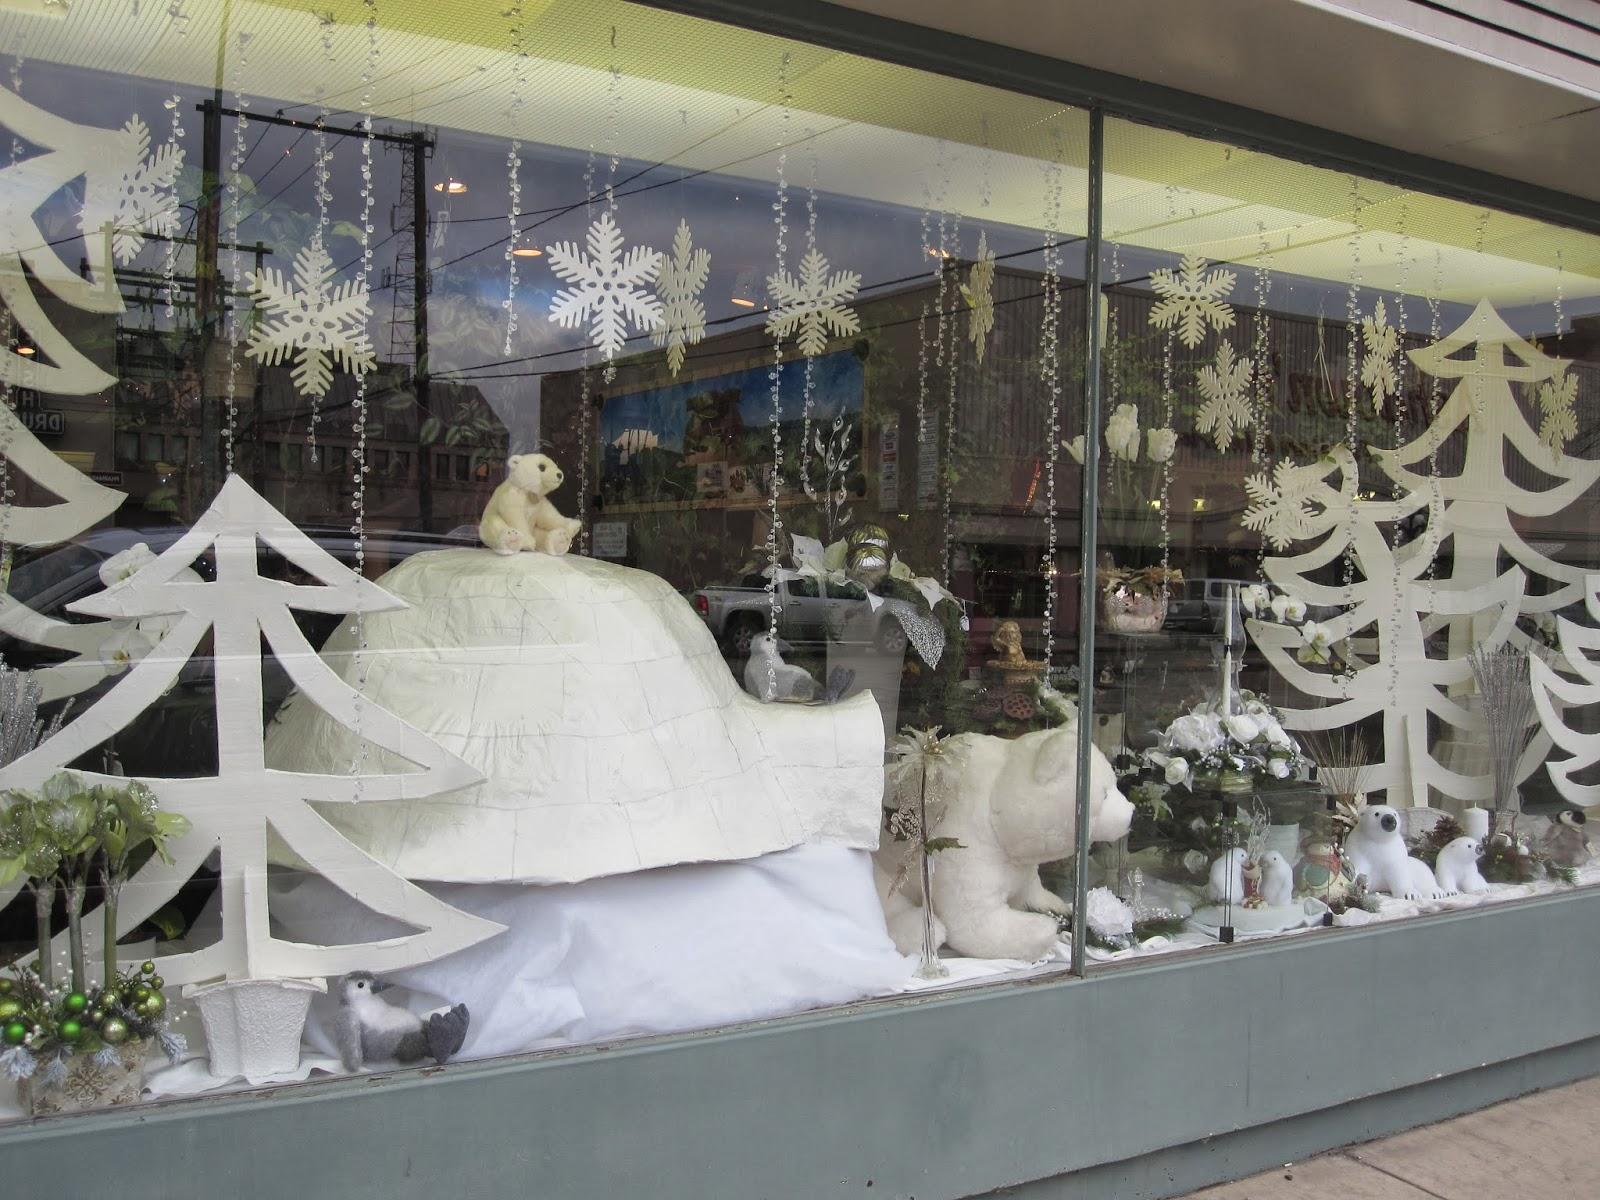 Winter window display, having some polar bears, an igloo and snowflakes hanging.